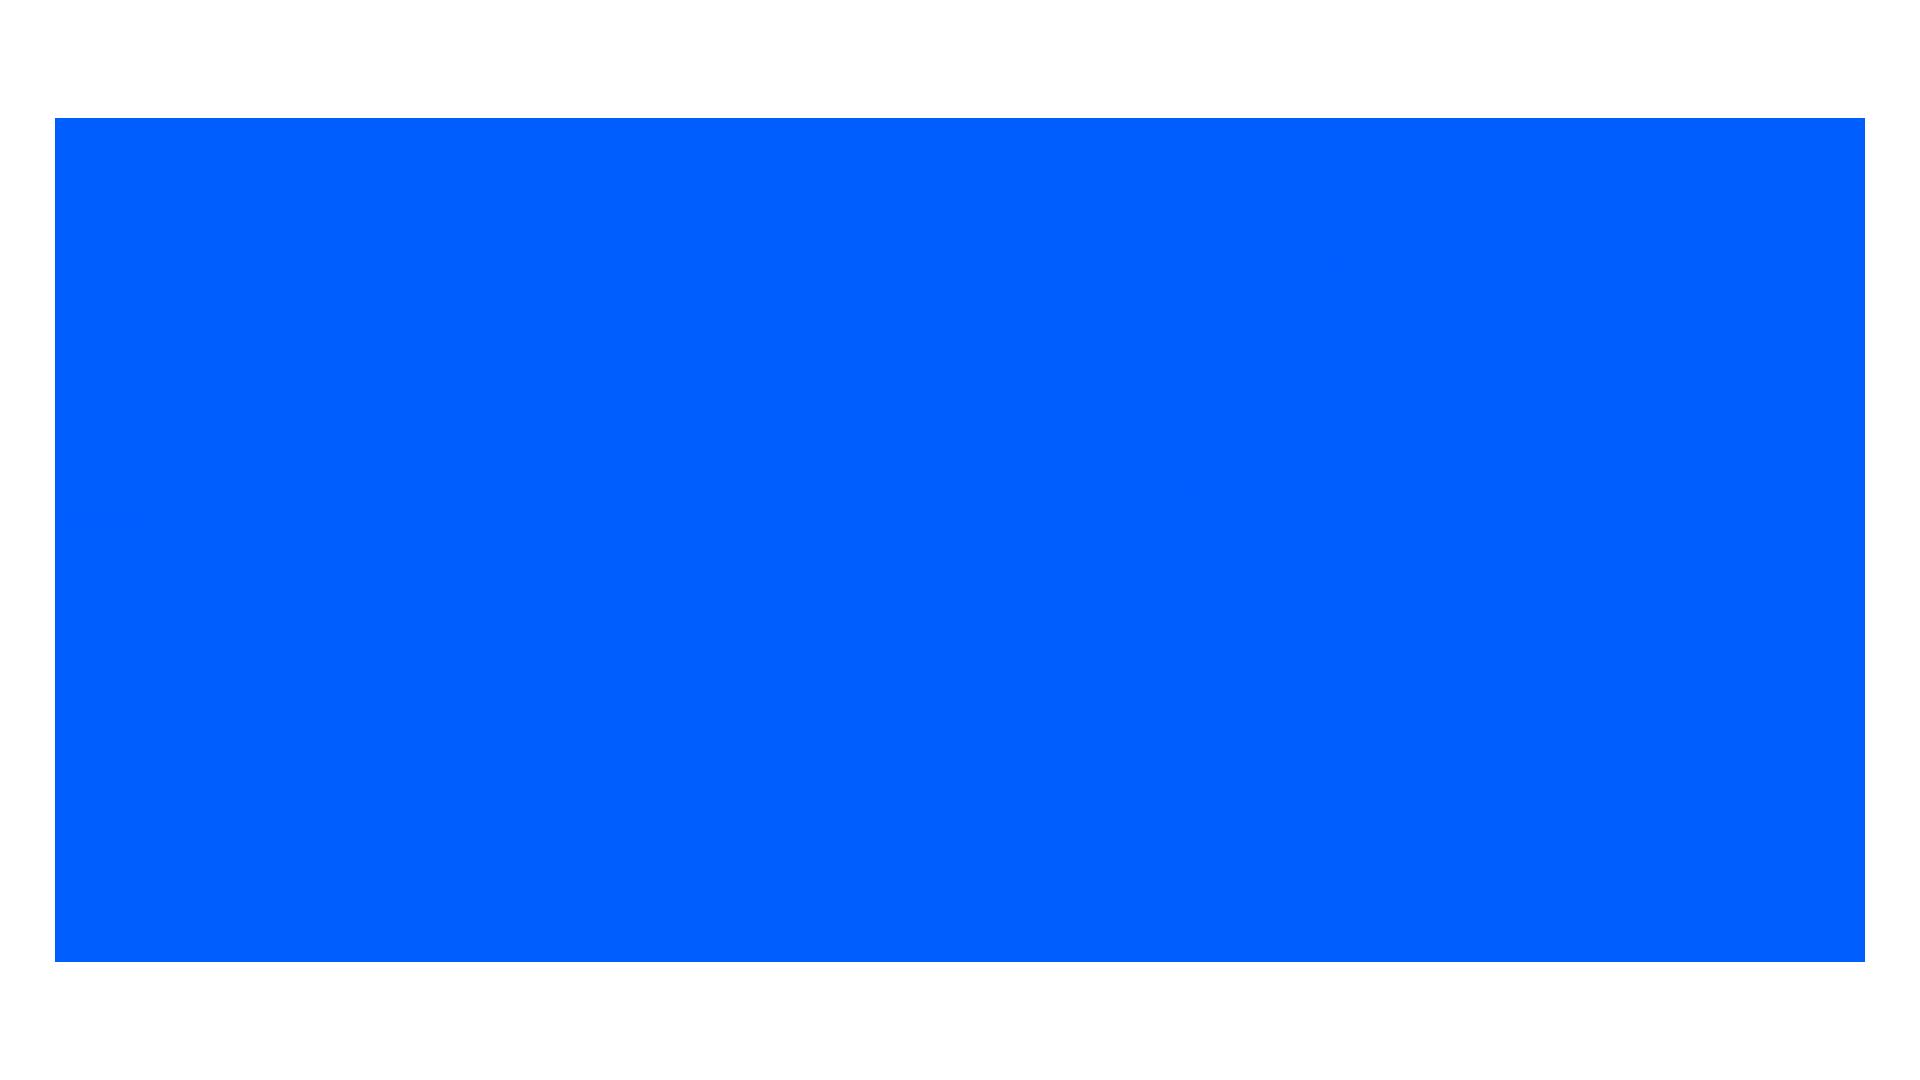 Broader Focus